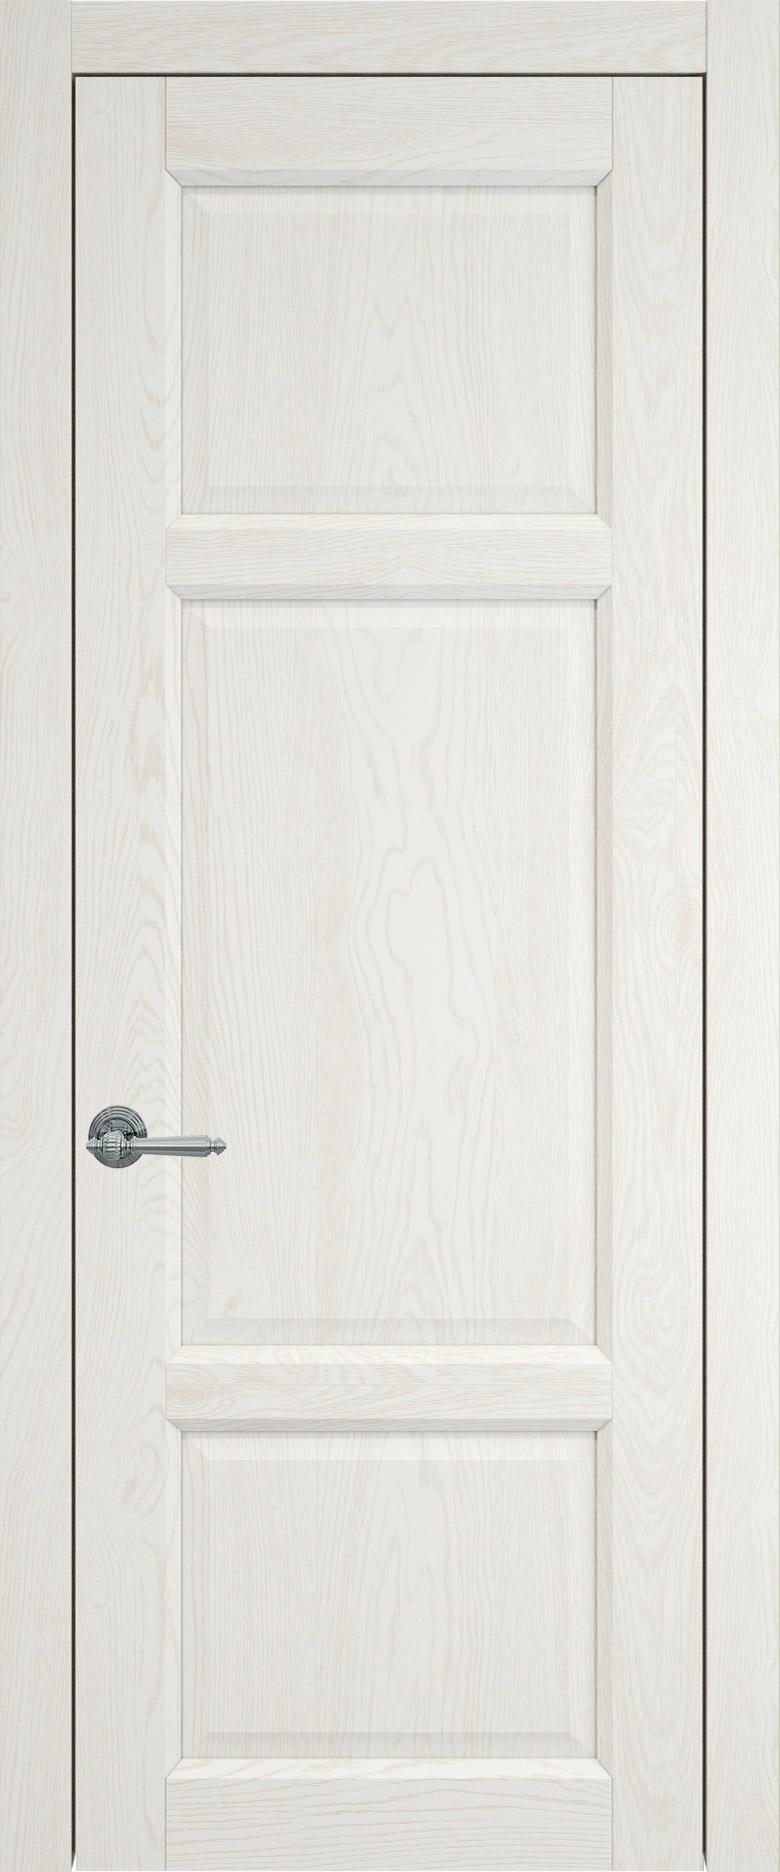 Siena цвет - Белый ясень (шпон) Без стекла (ДГ)